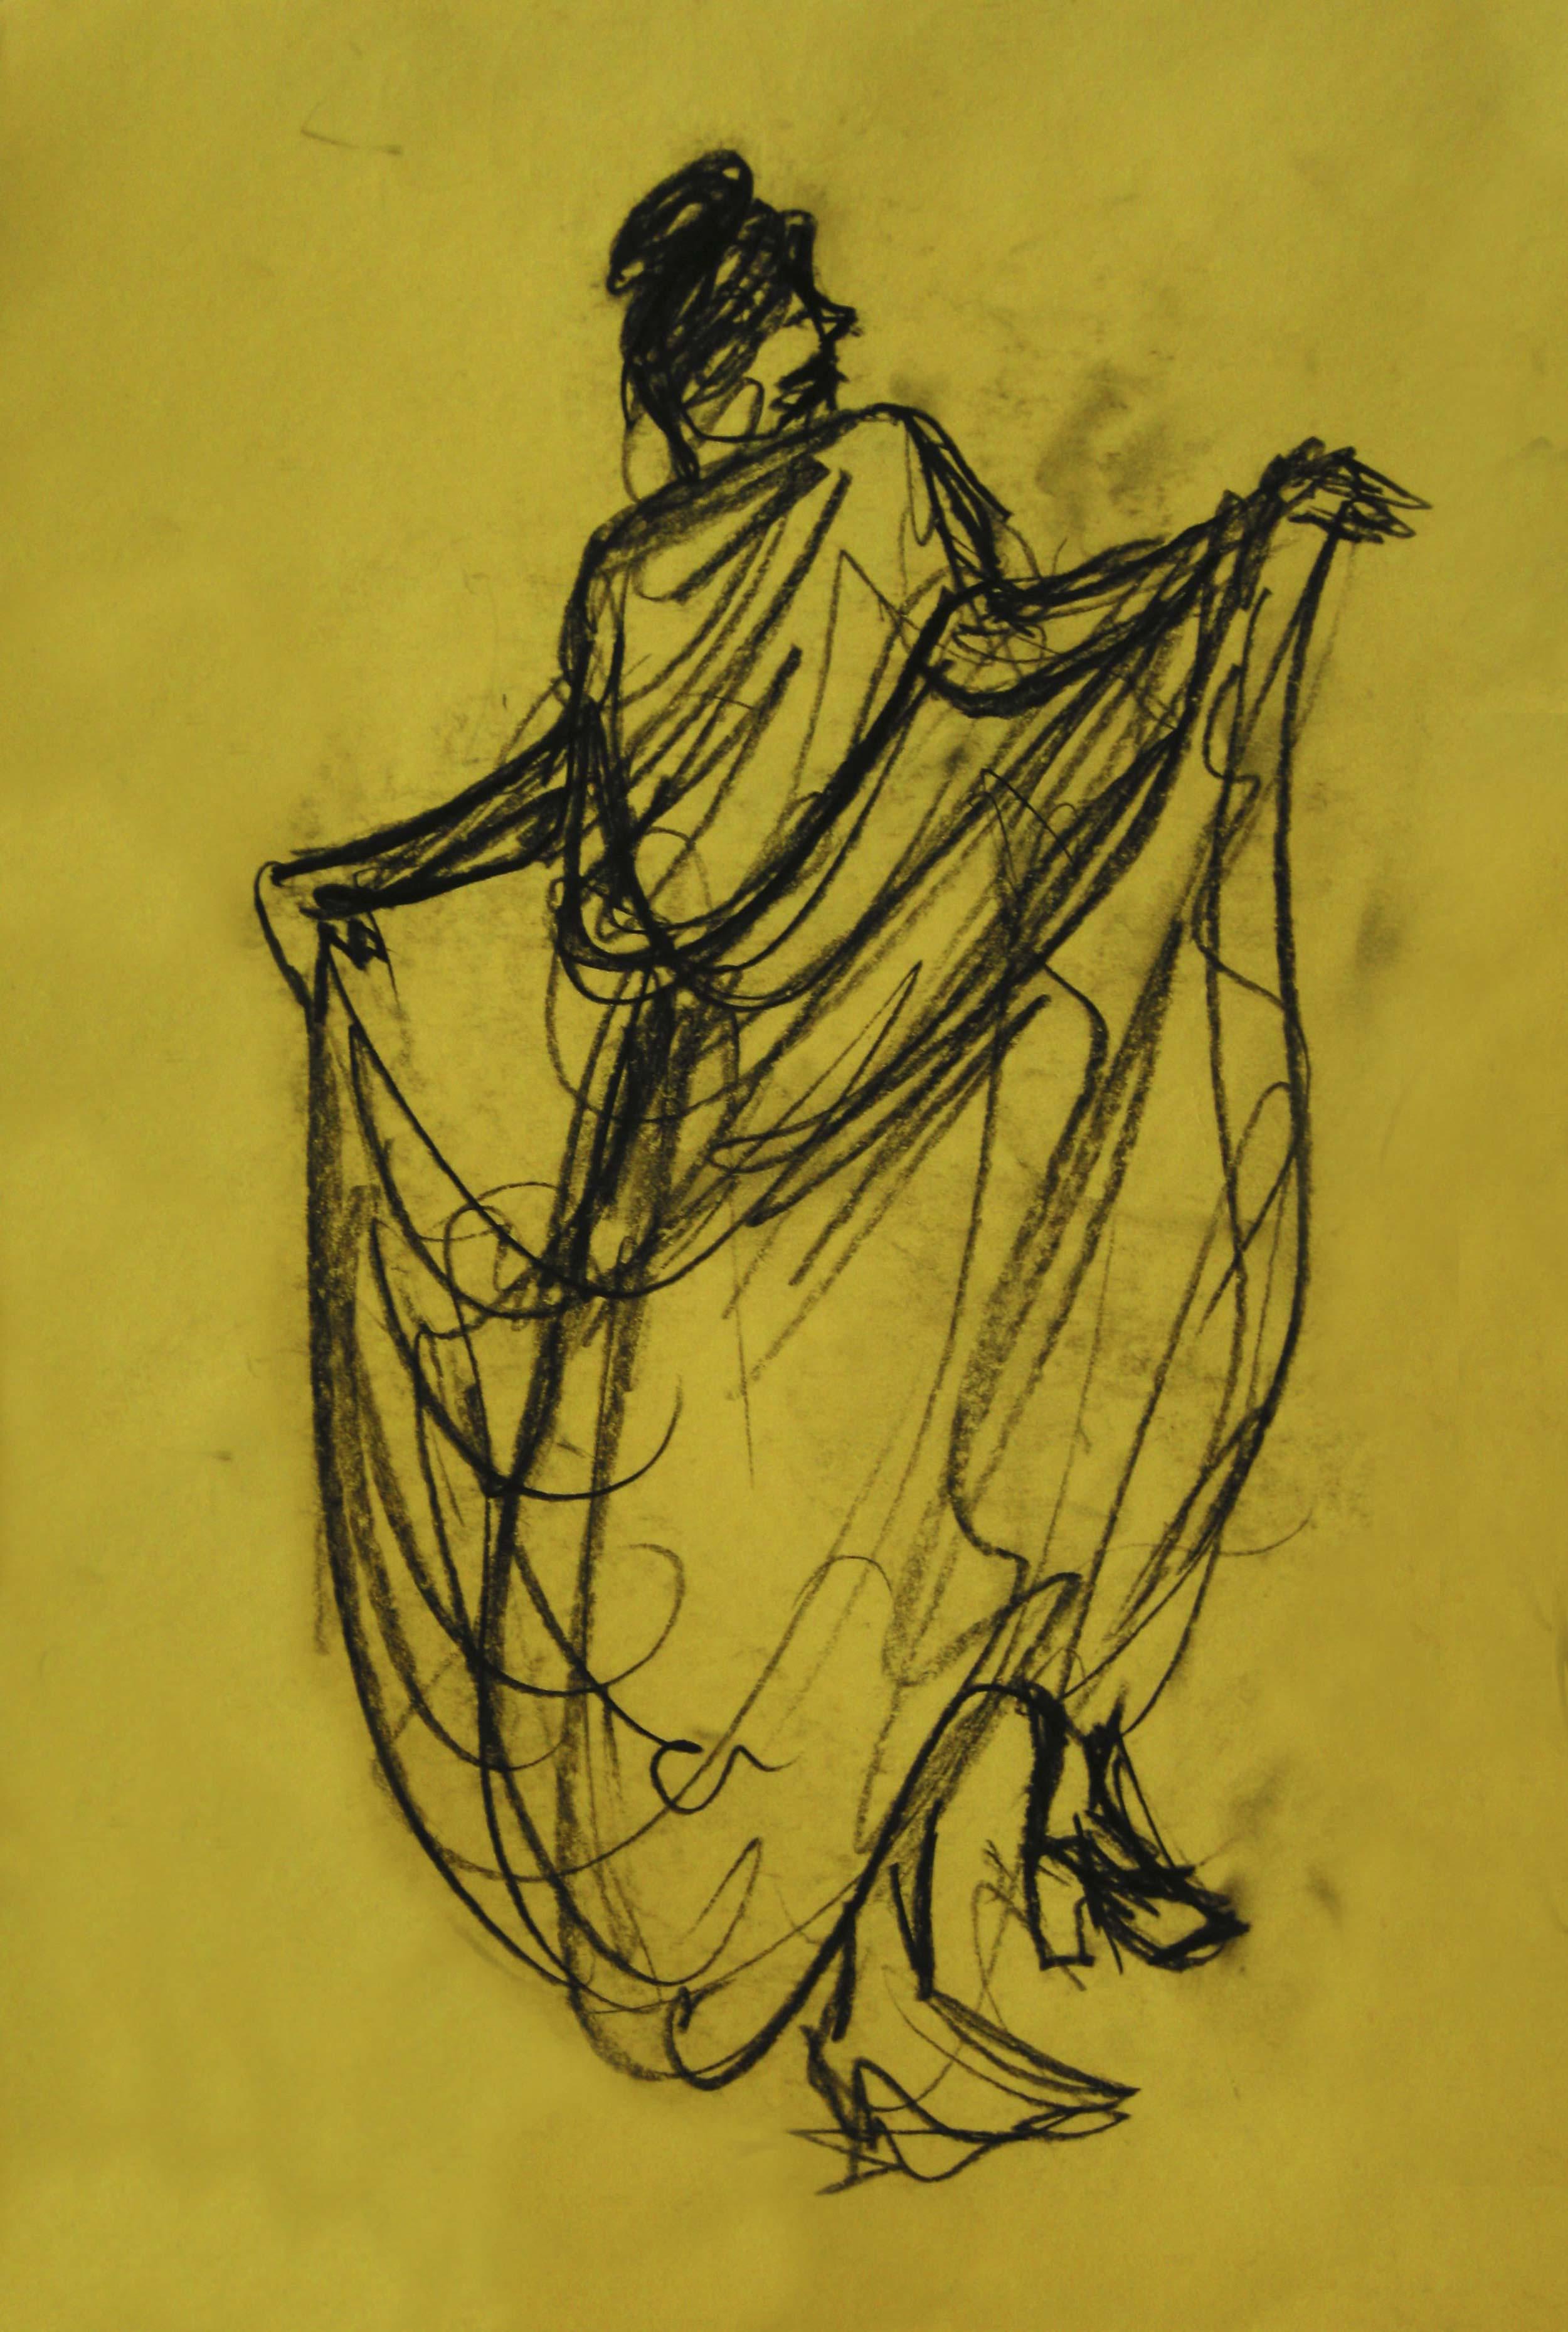 FANDANGO  Charcoal on paper  32 x 41 cm   2008